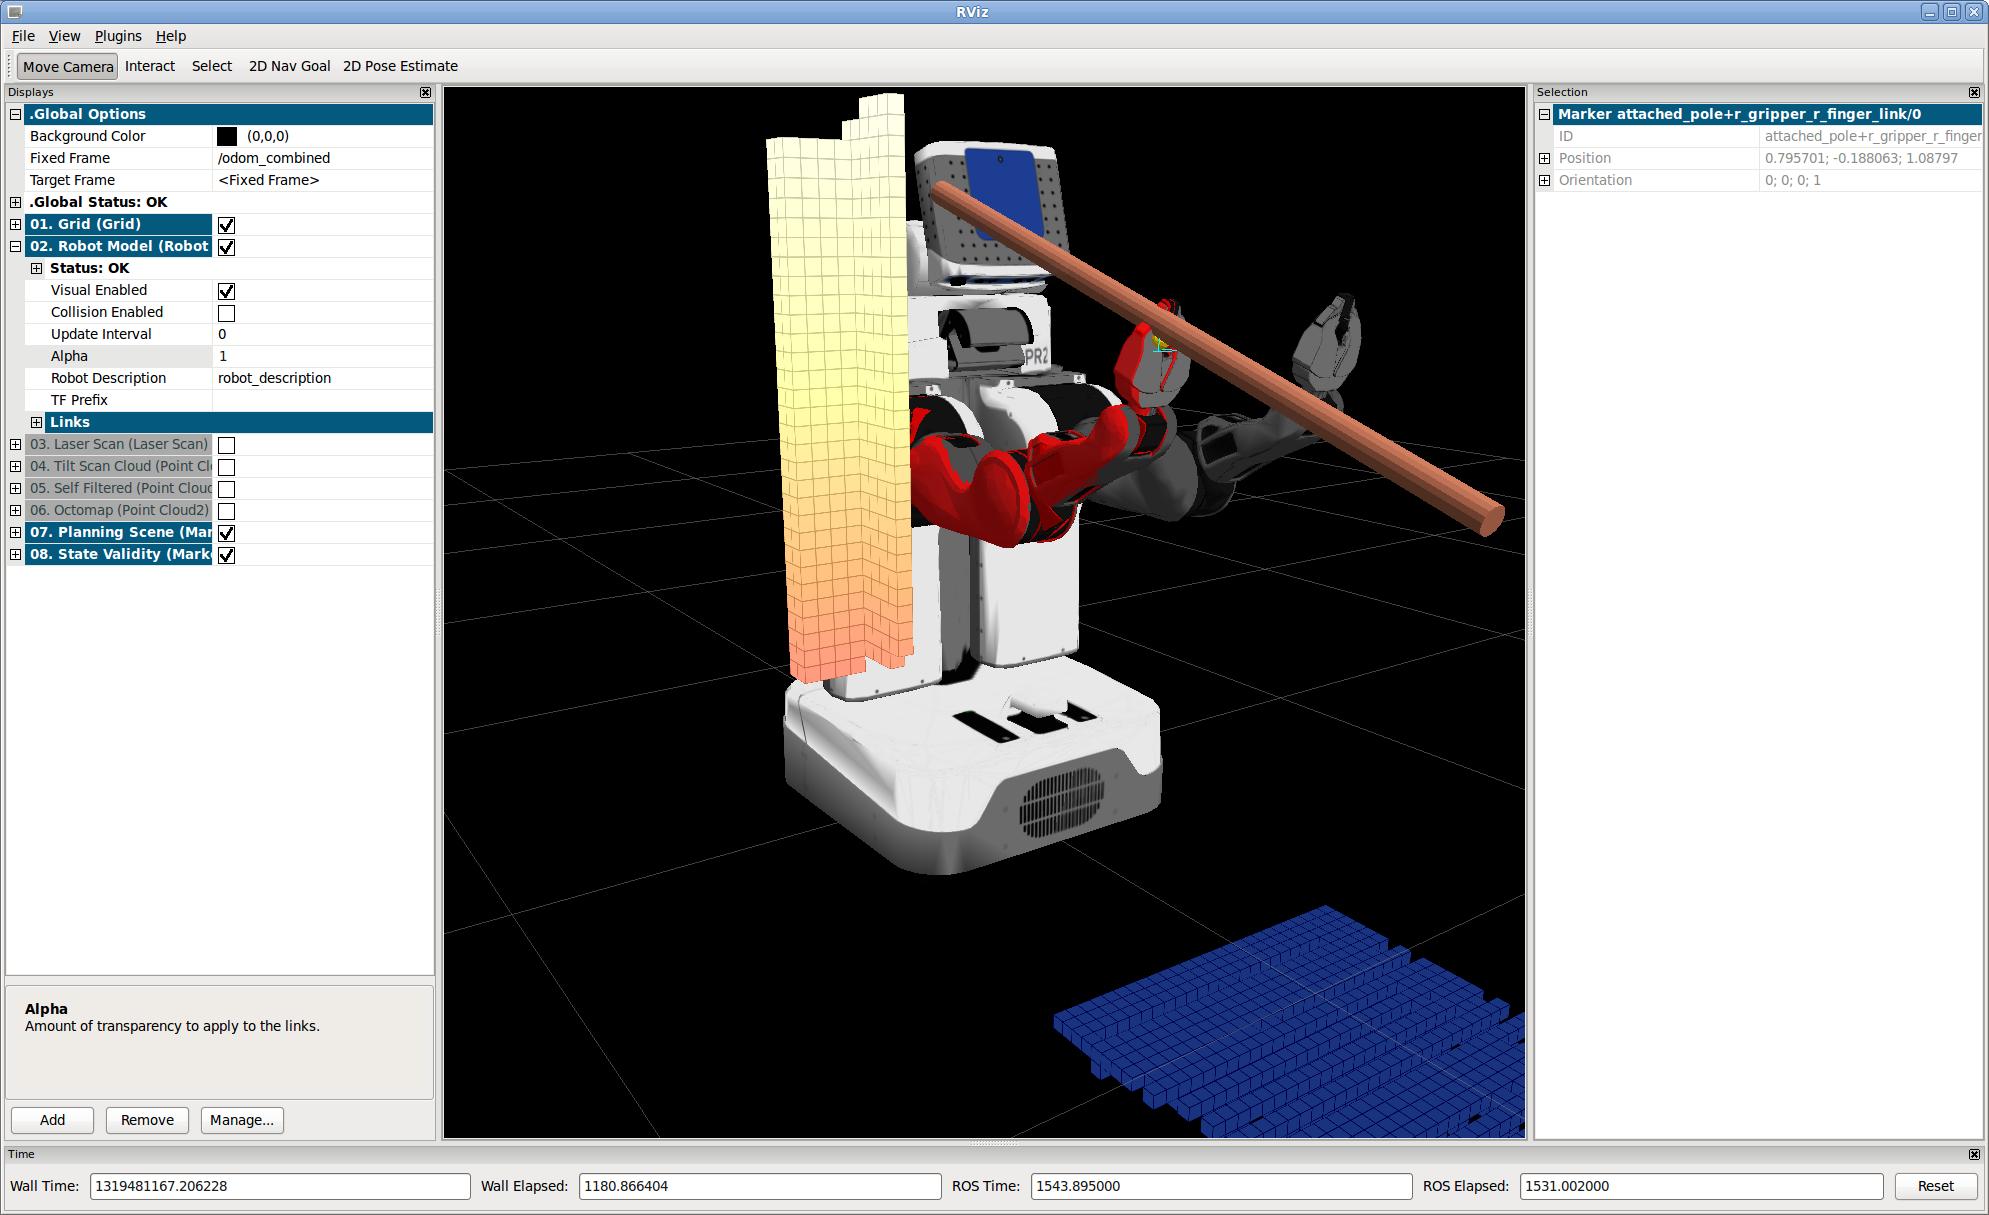 arm_navigation/Tutorials/Planning Scene/Attaching Virtual